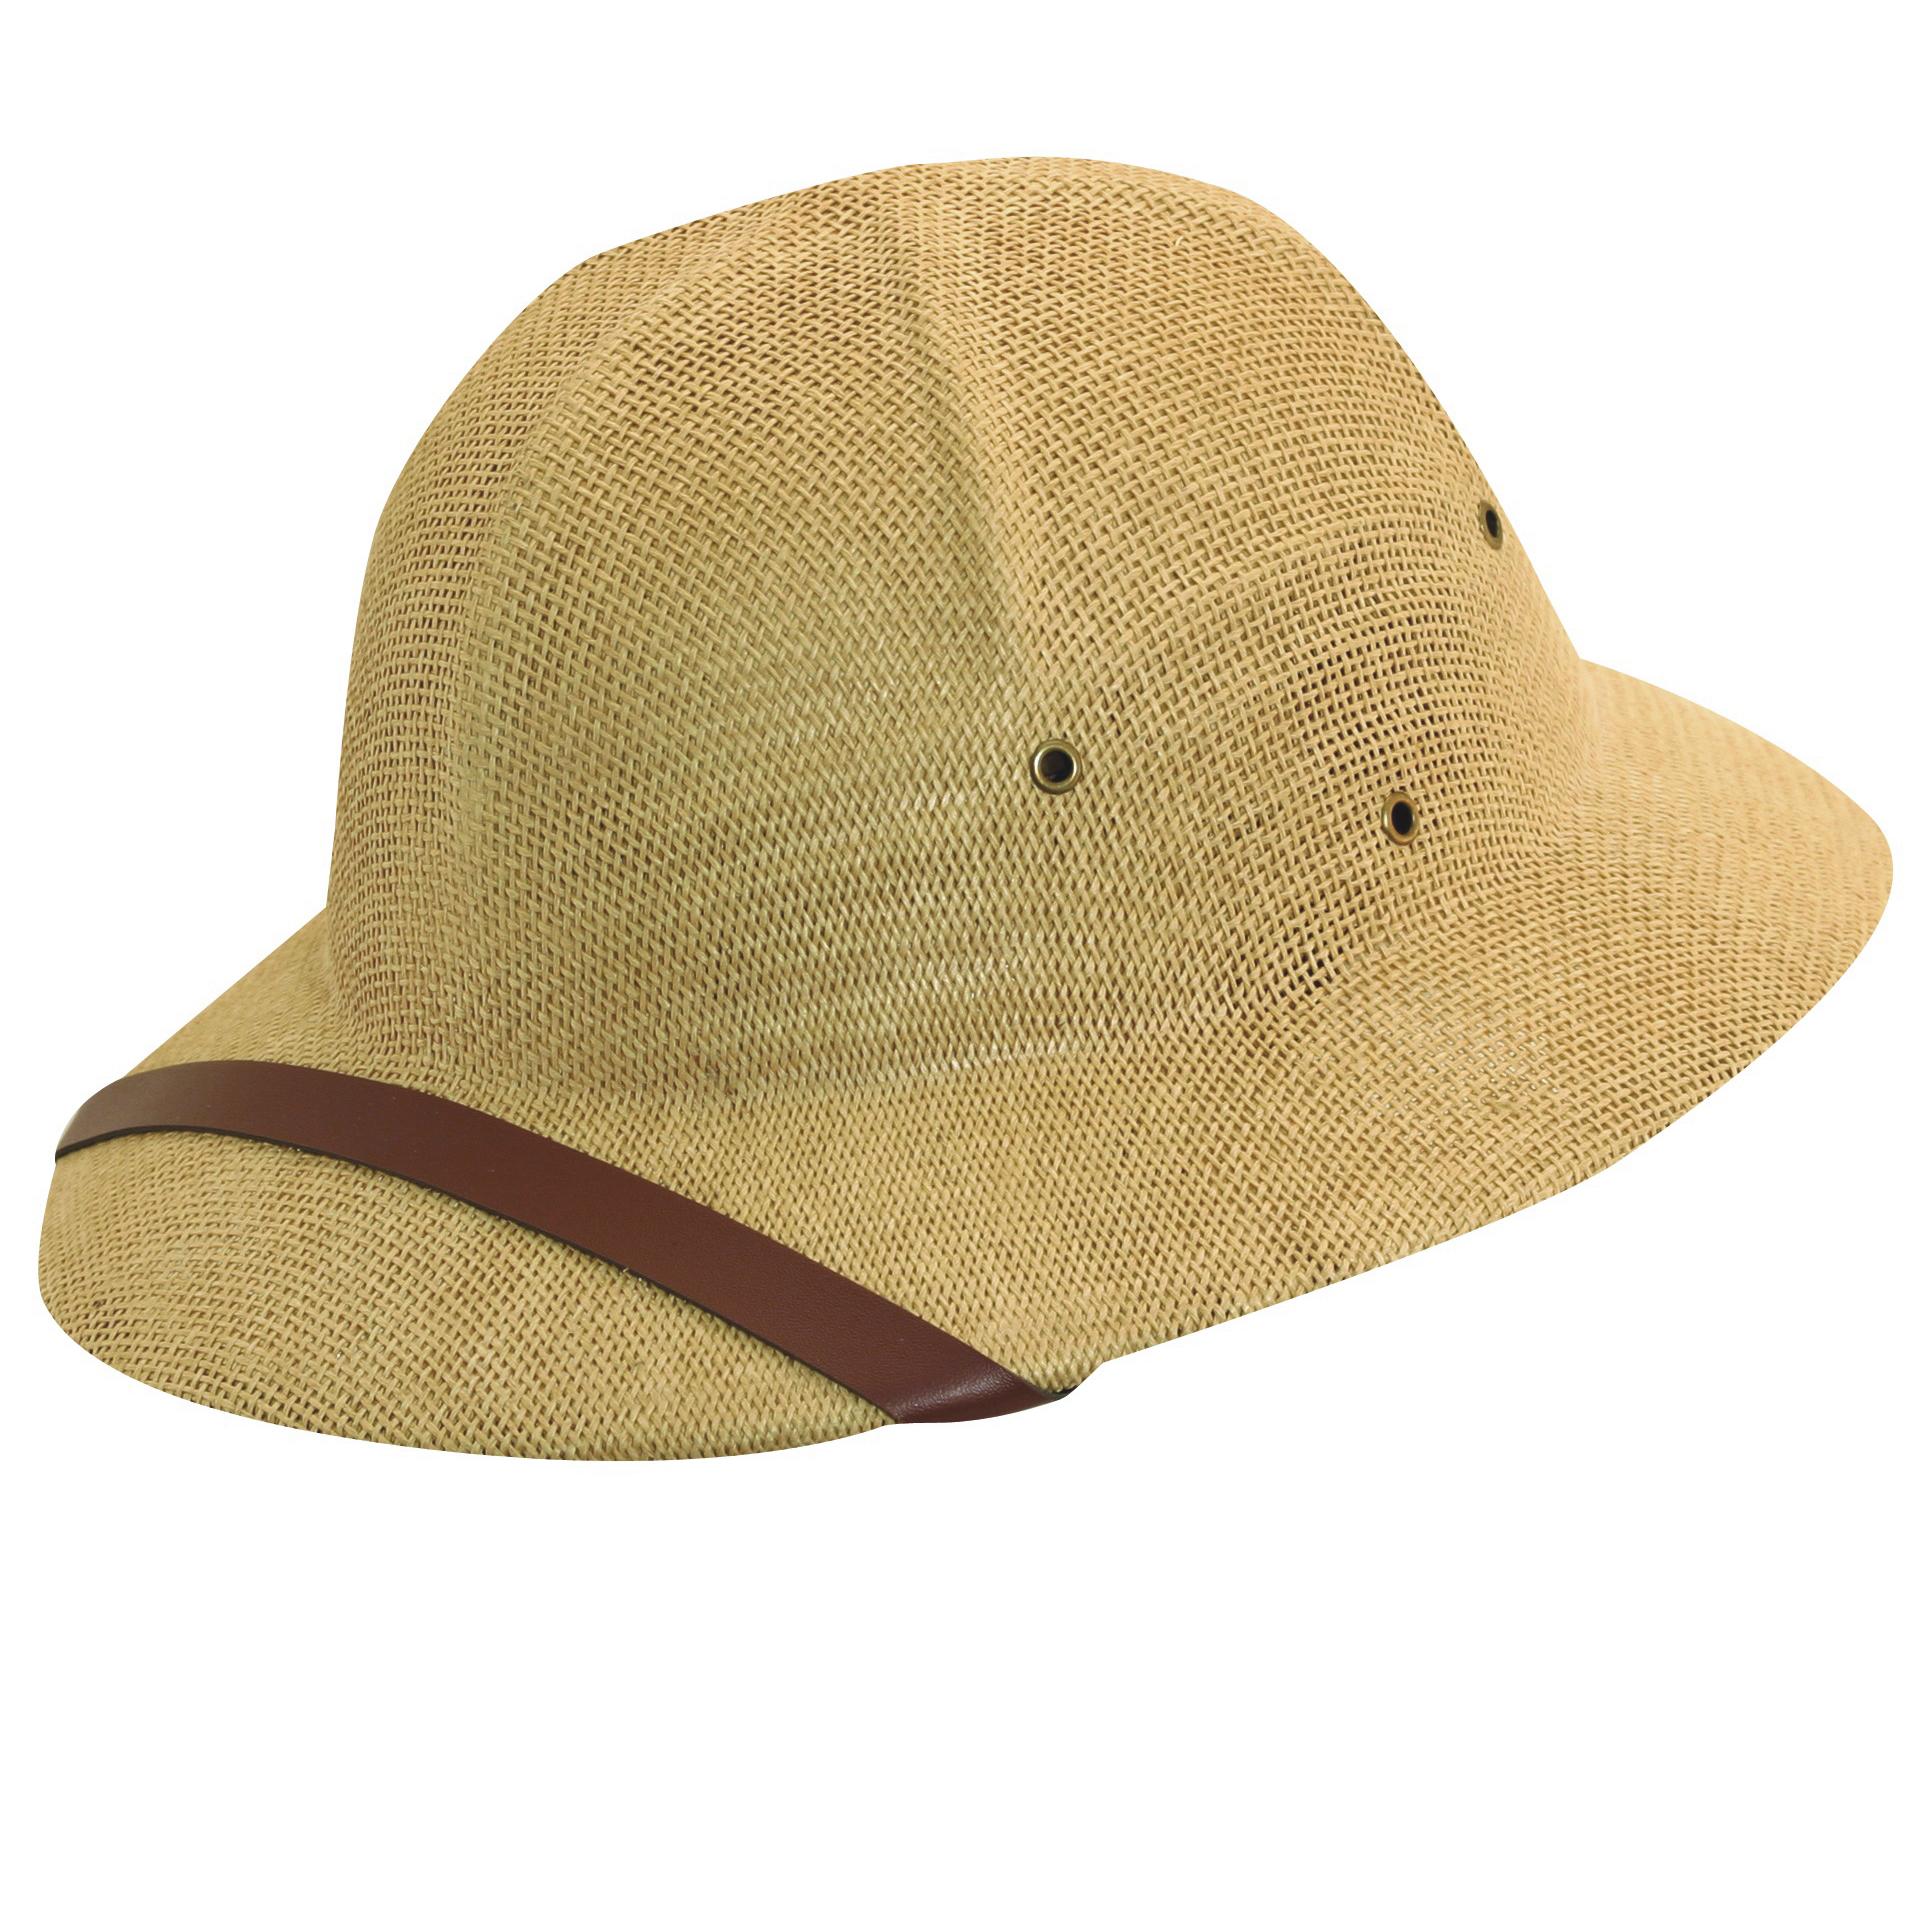 Pith Helmet Safari Hat